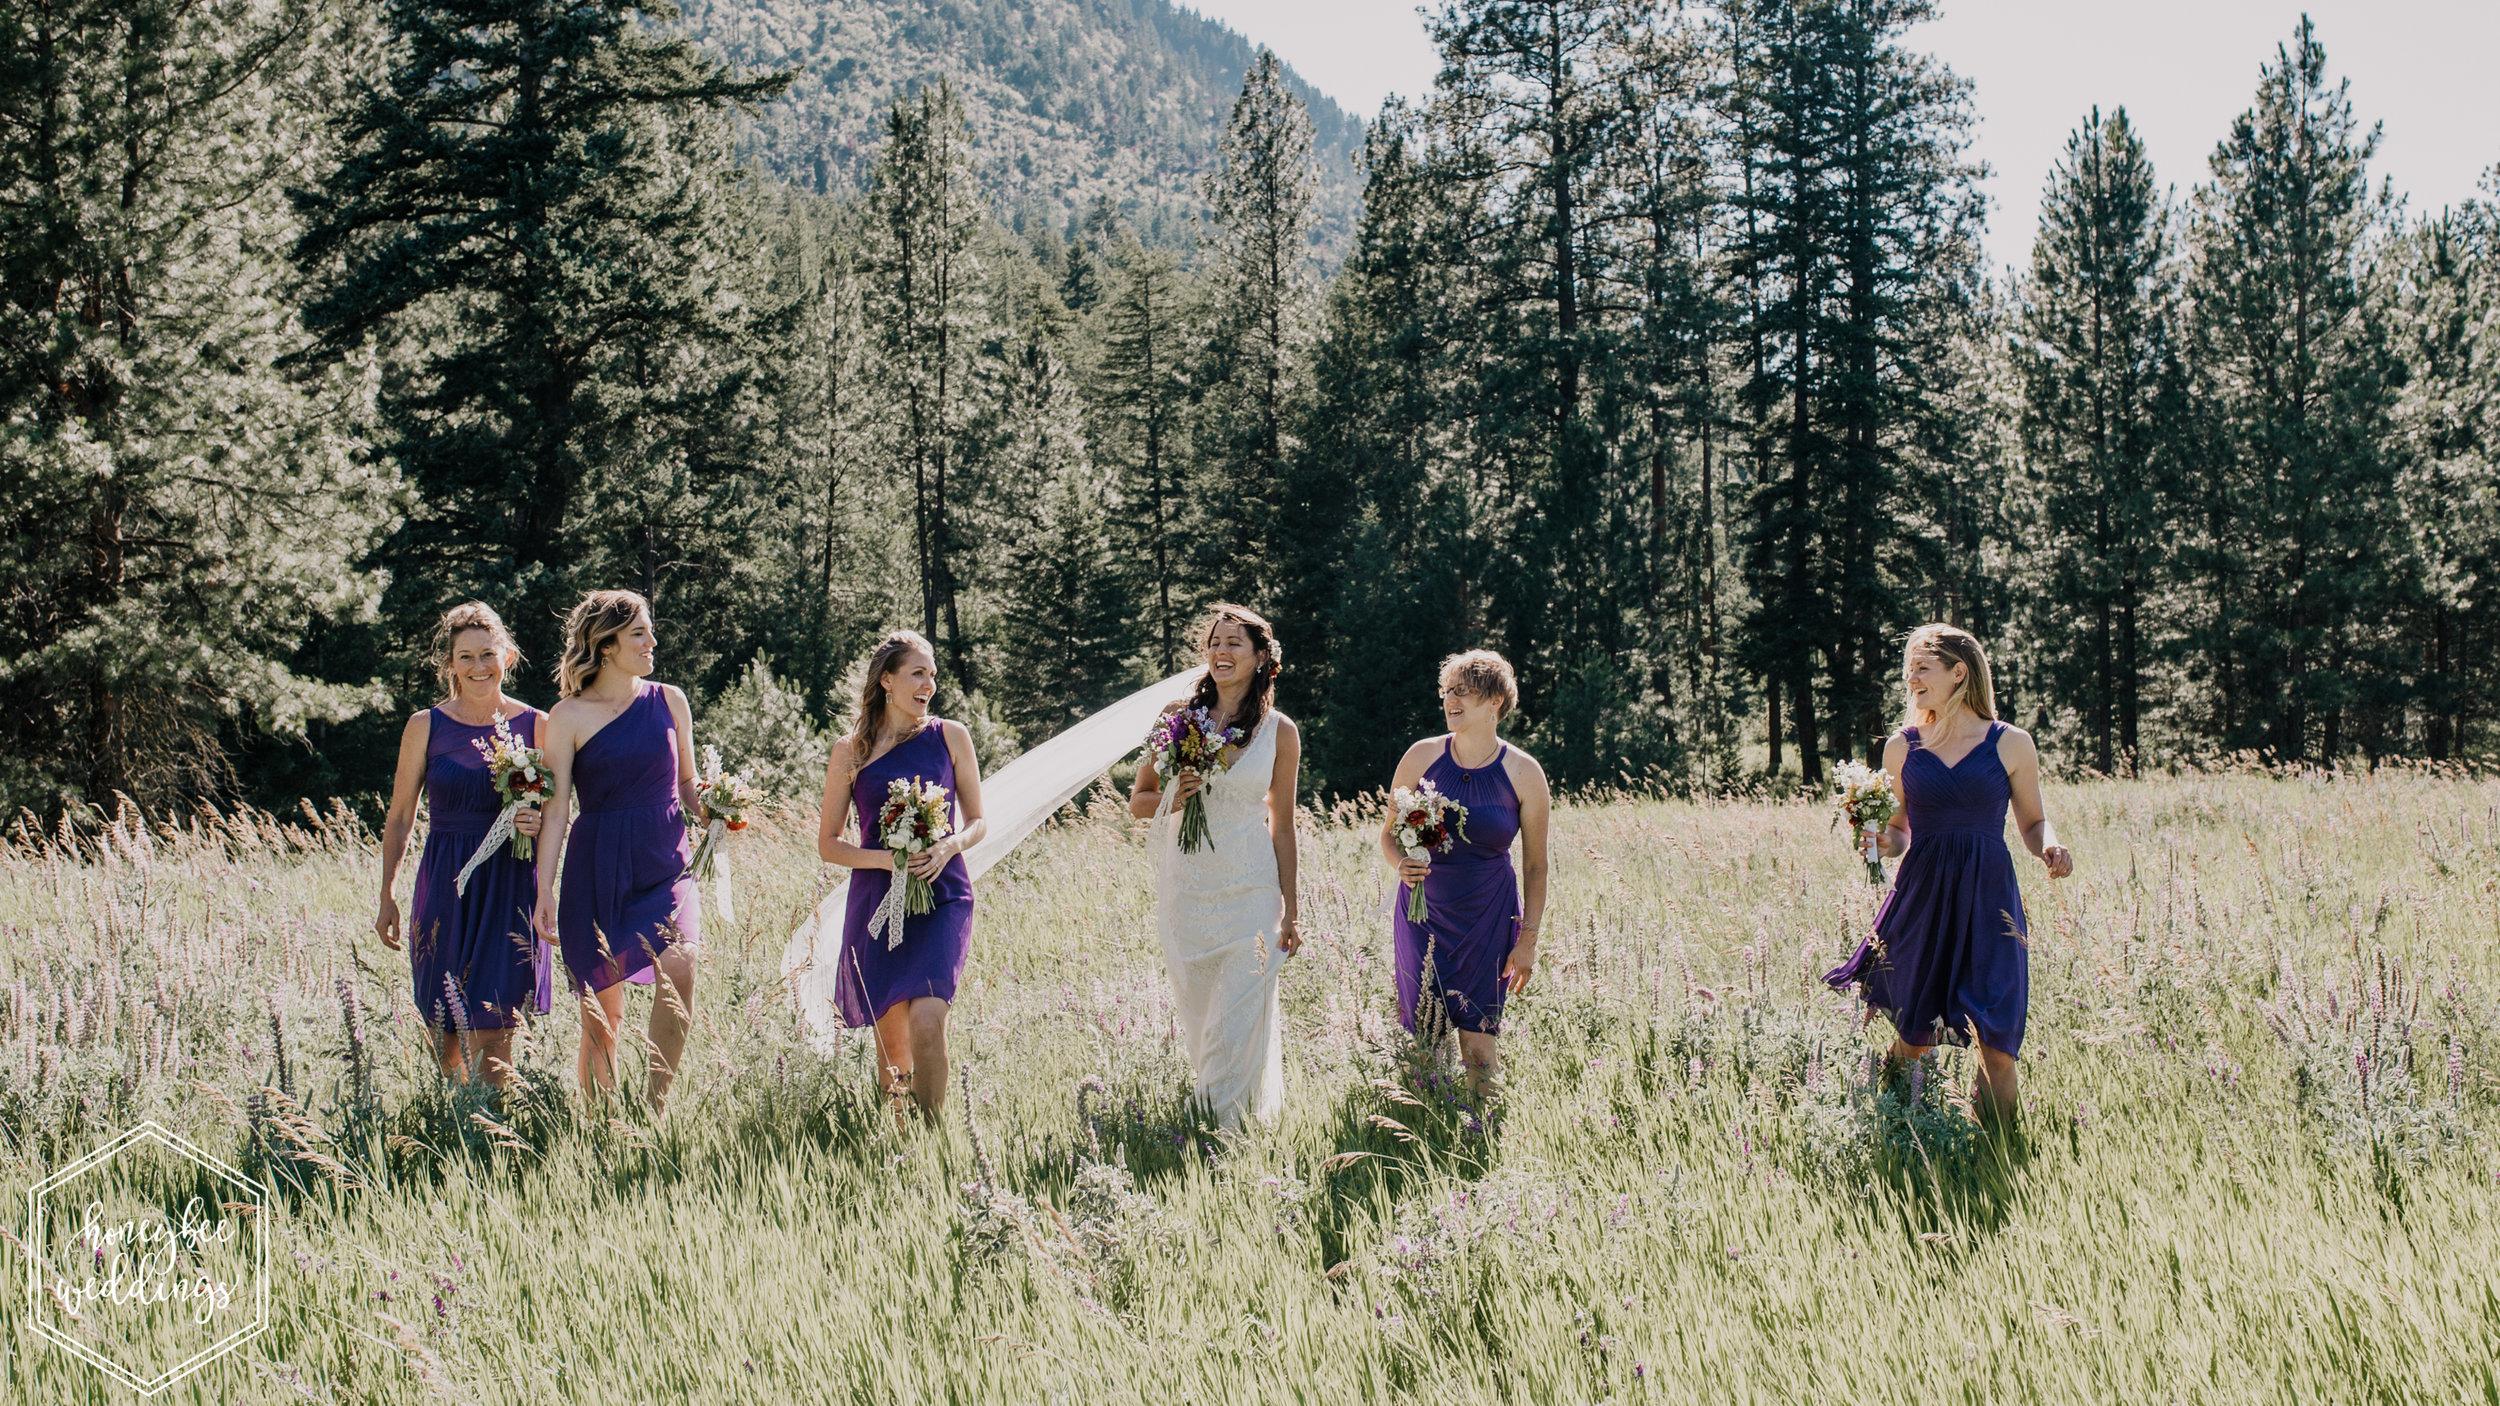 386 White Raven Wedding_Montana Wedding Photographer_Honeybee Weddings_ Meghan Maloney + Arza Hammond 2018-0415-2.jpg